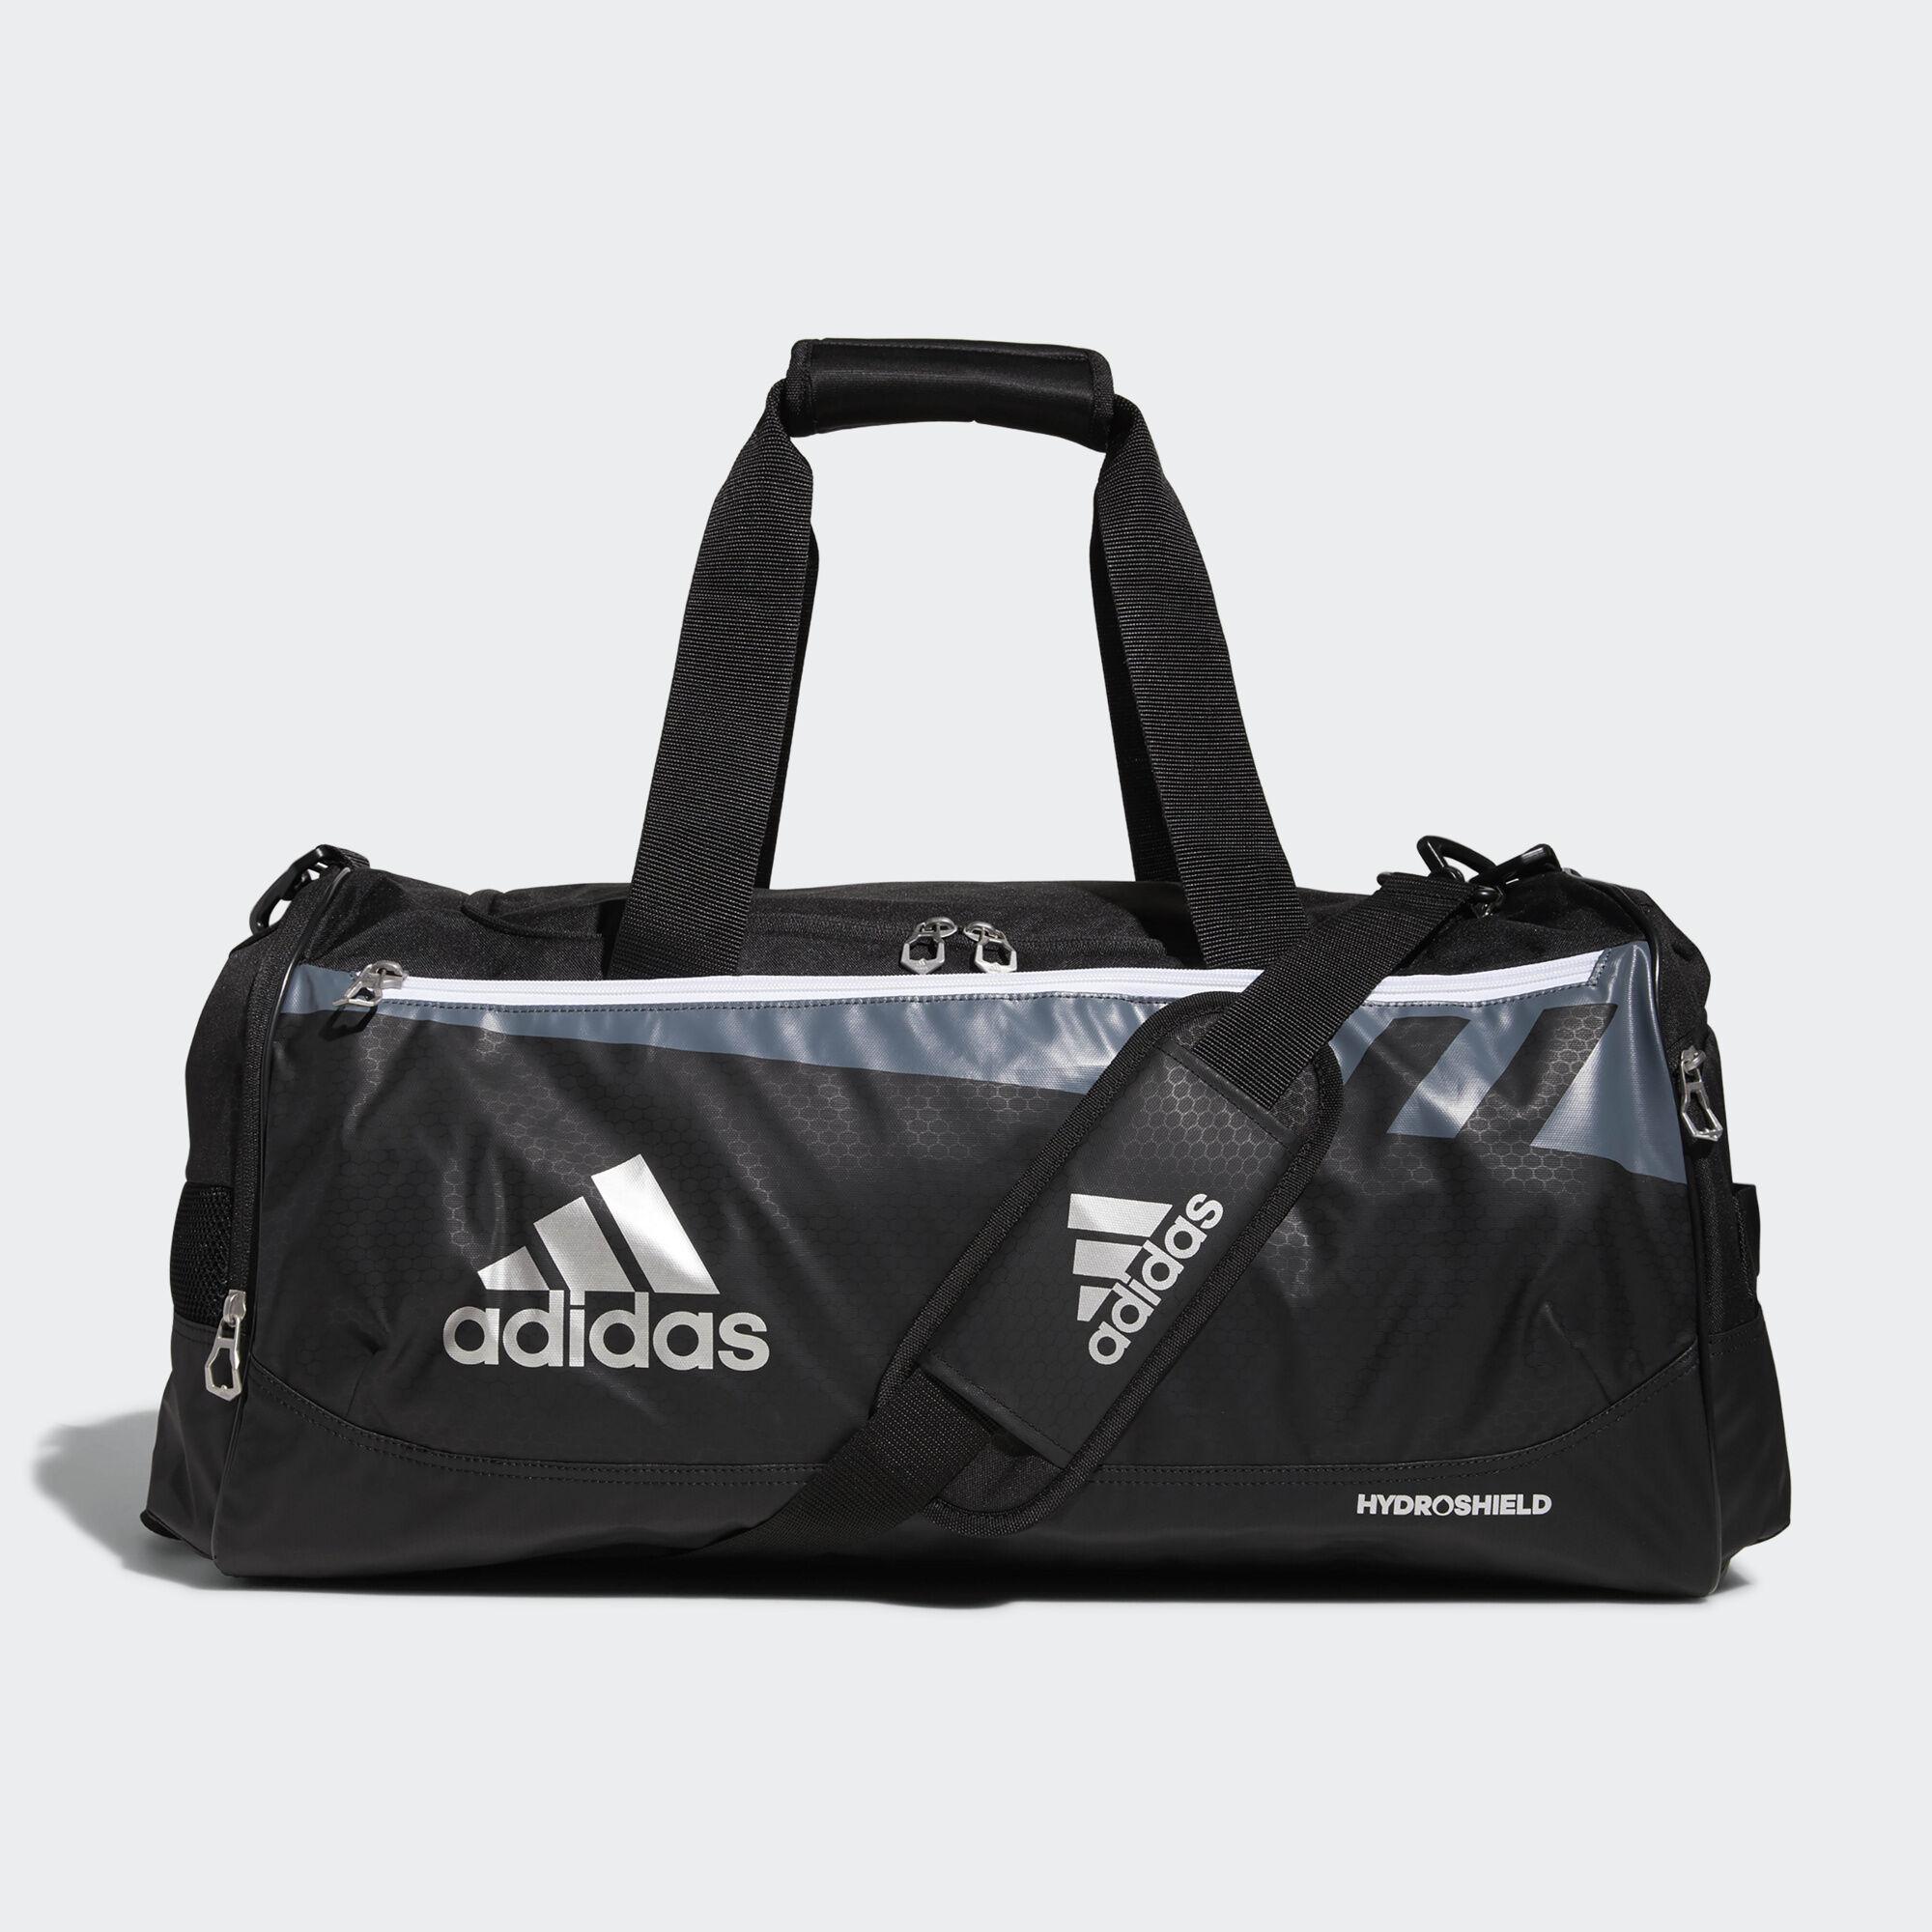 adidas black friday sale 2017